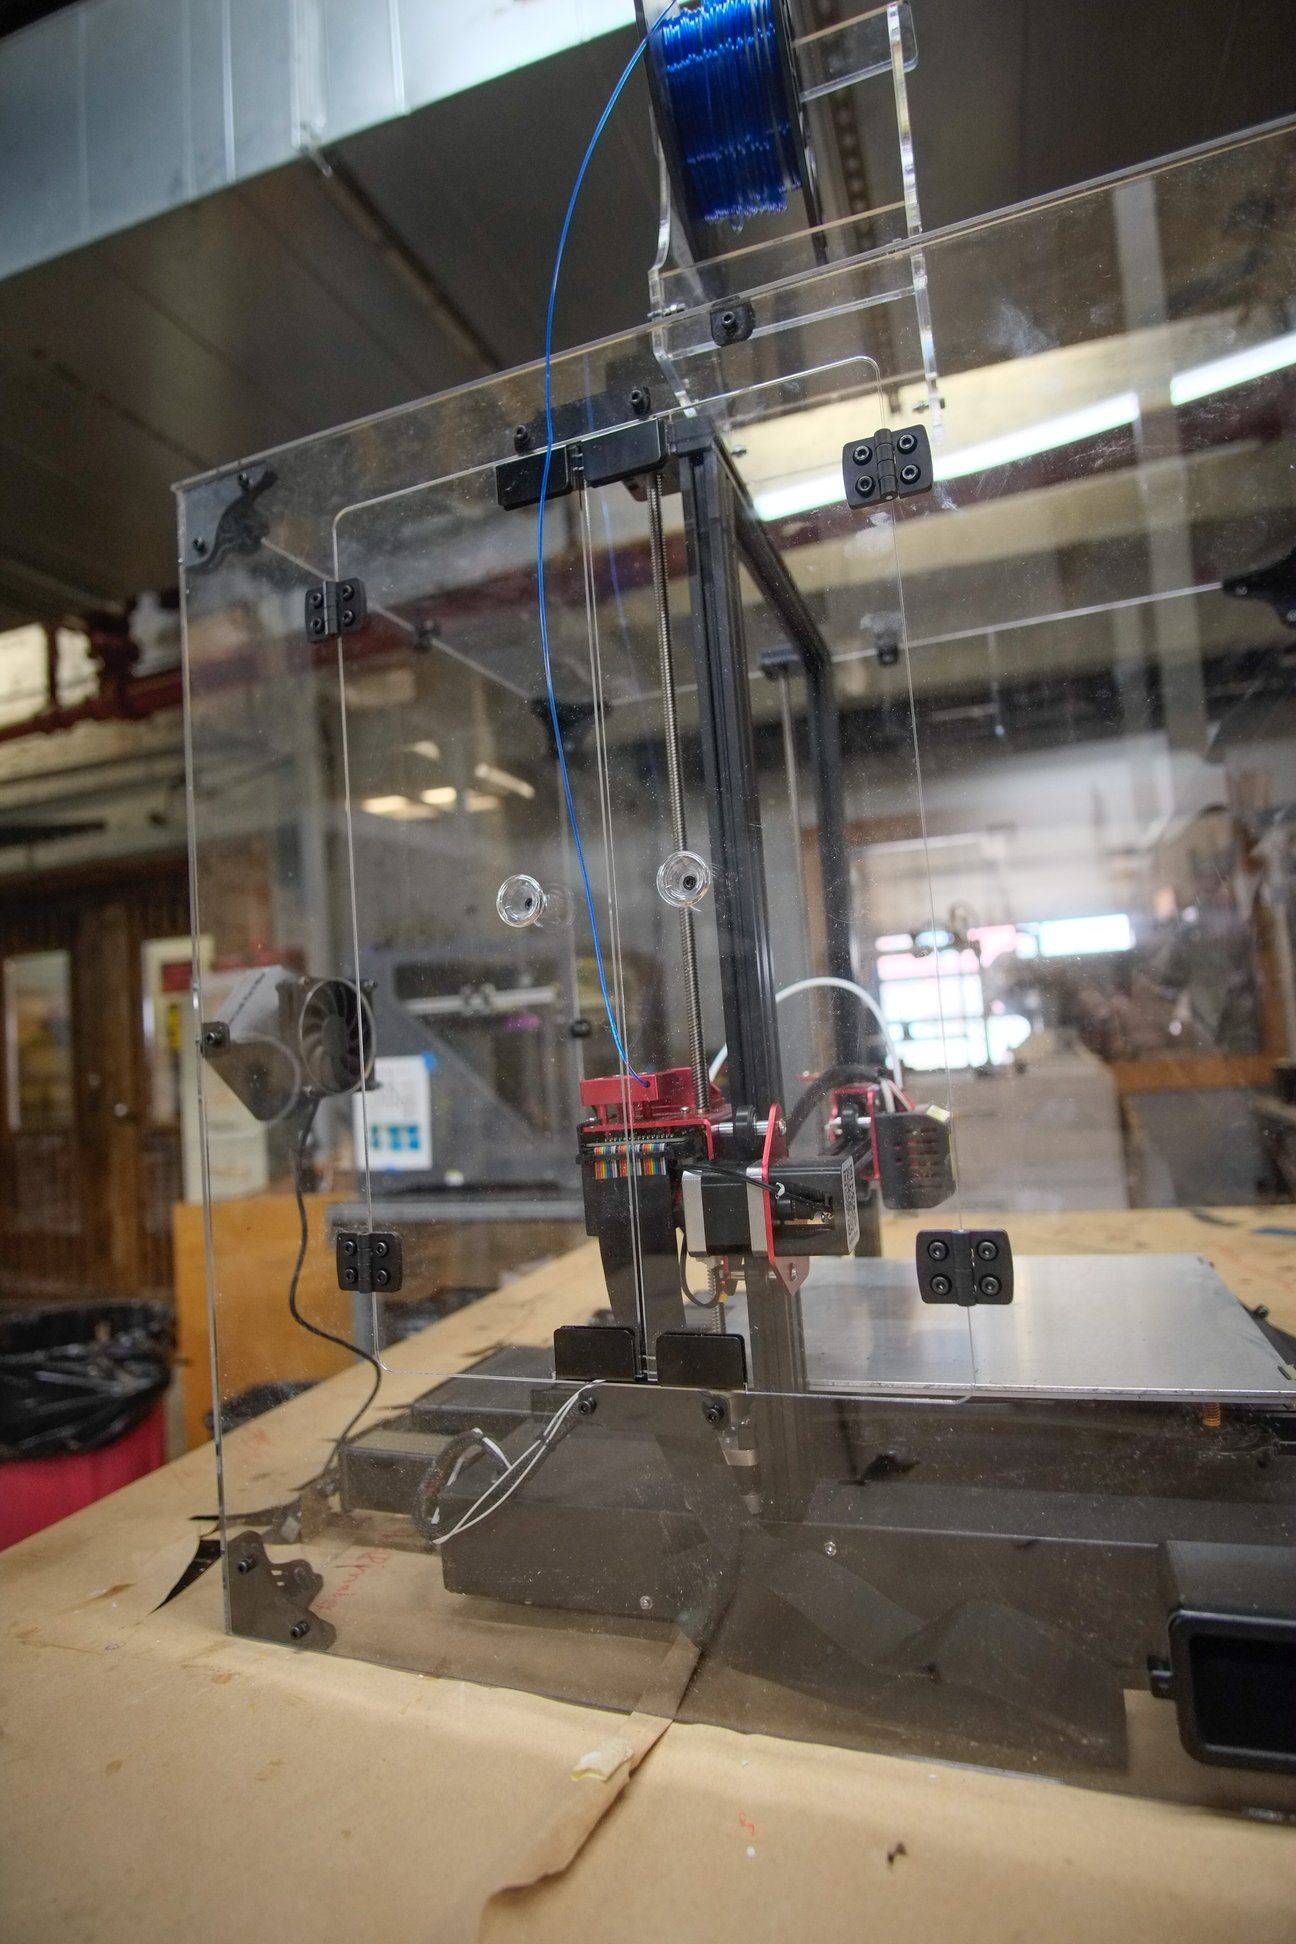 CR-10S Pro V1 & V2 Acrylic Enclosure Case Kit   3d printing. Magnetic latch. Metal 3d printer